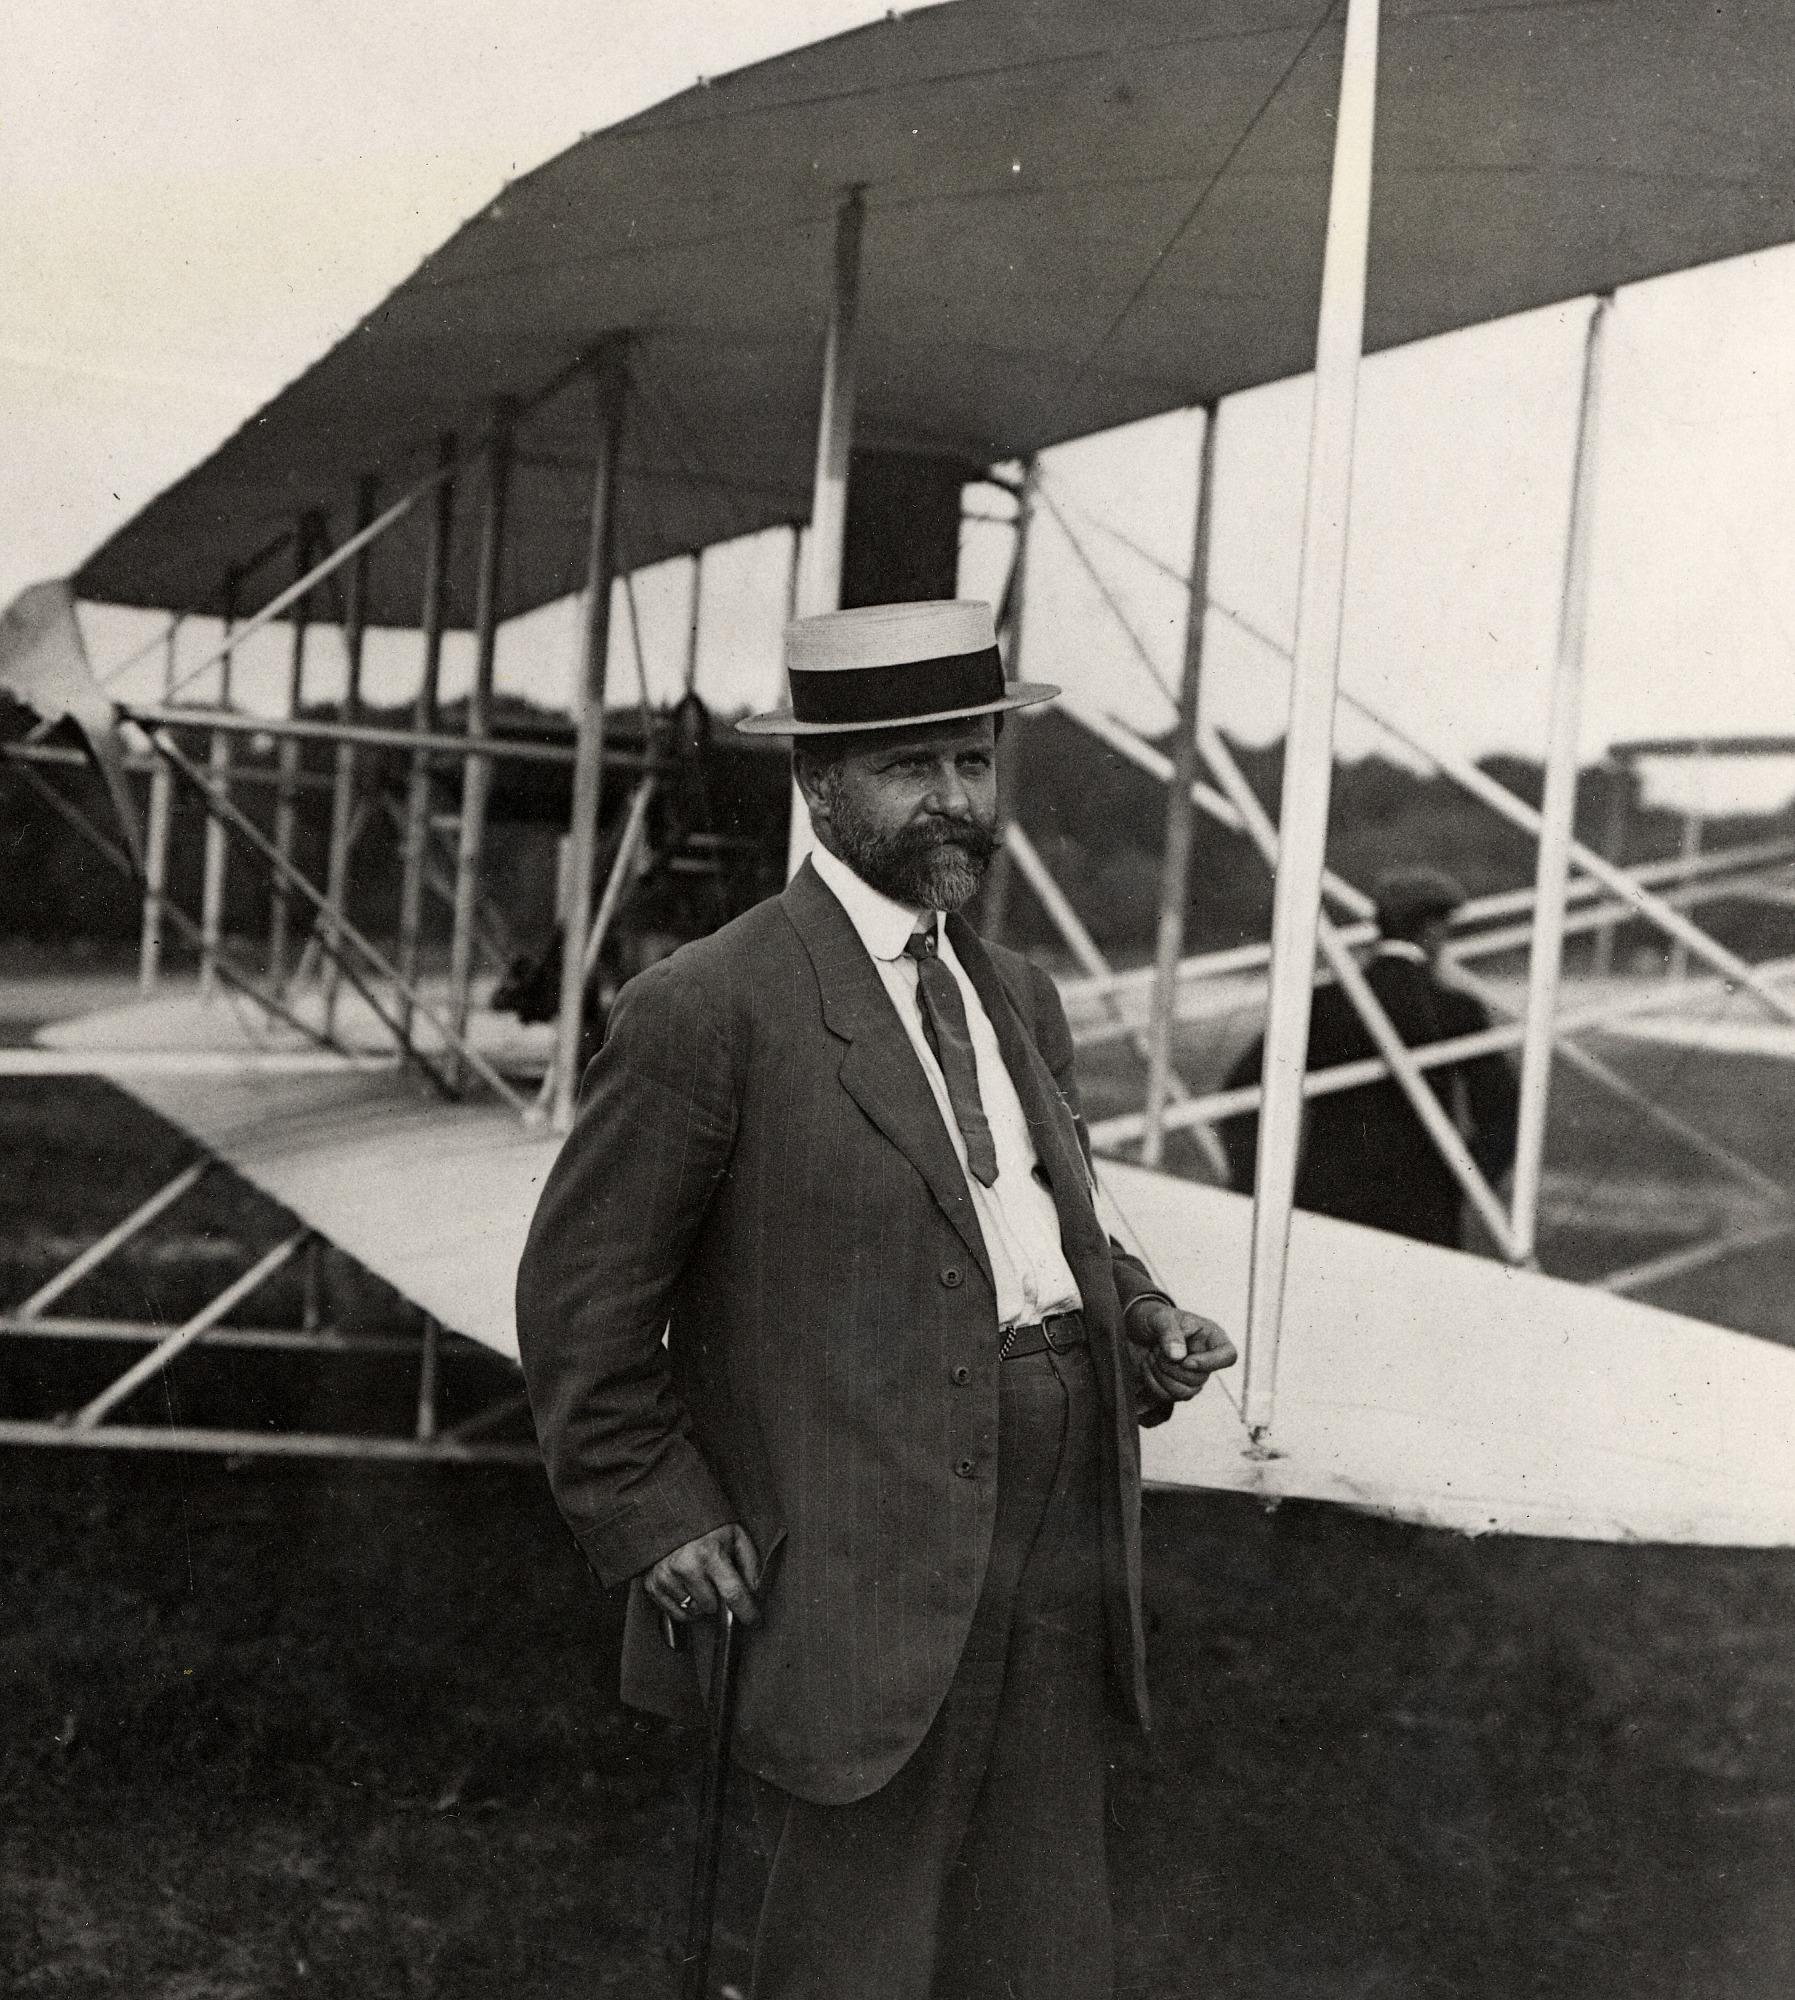 William J. Hammer Collection